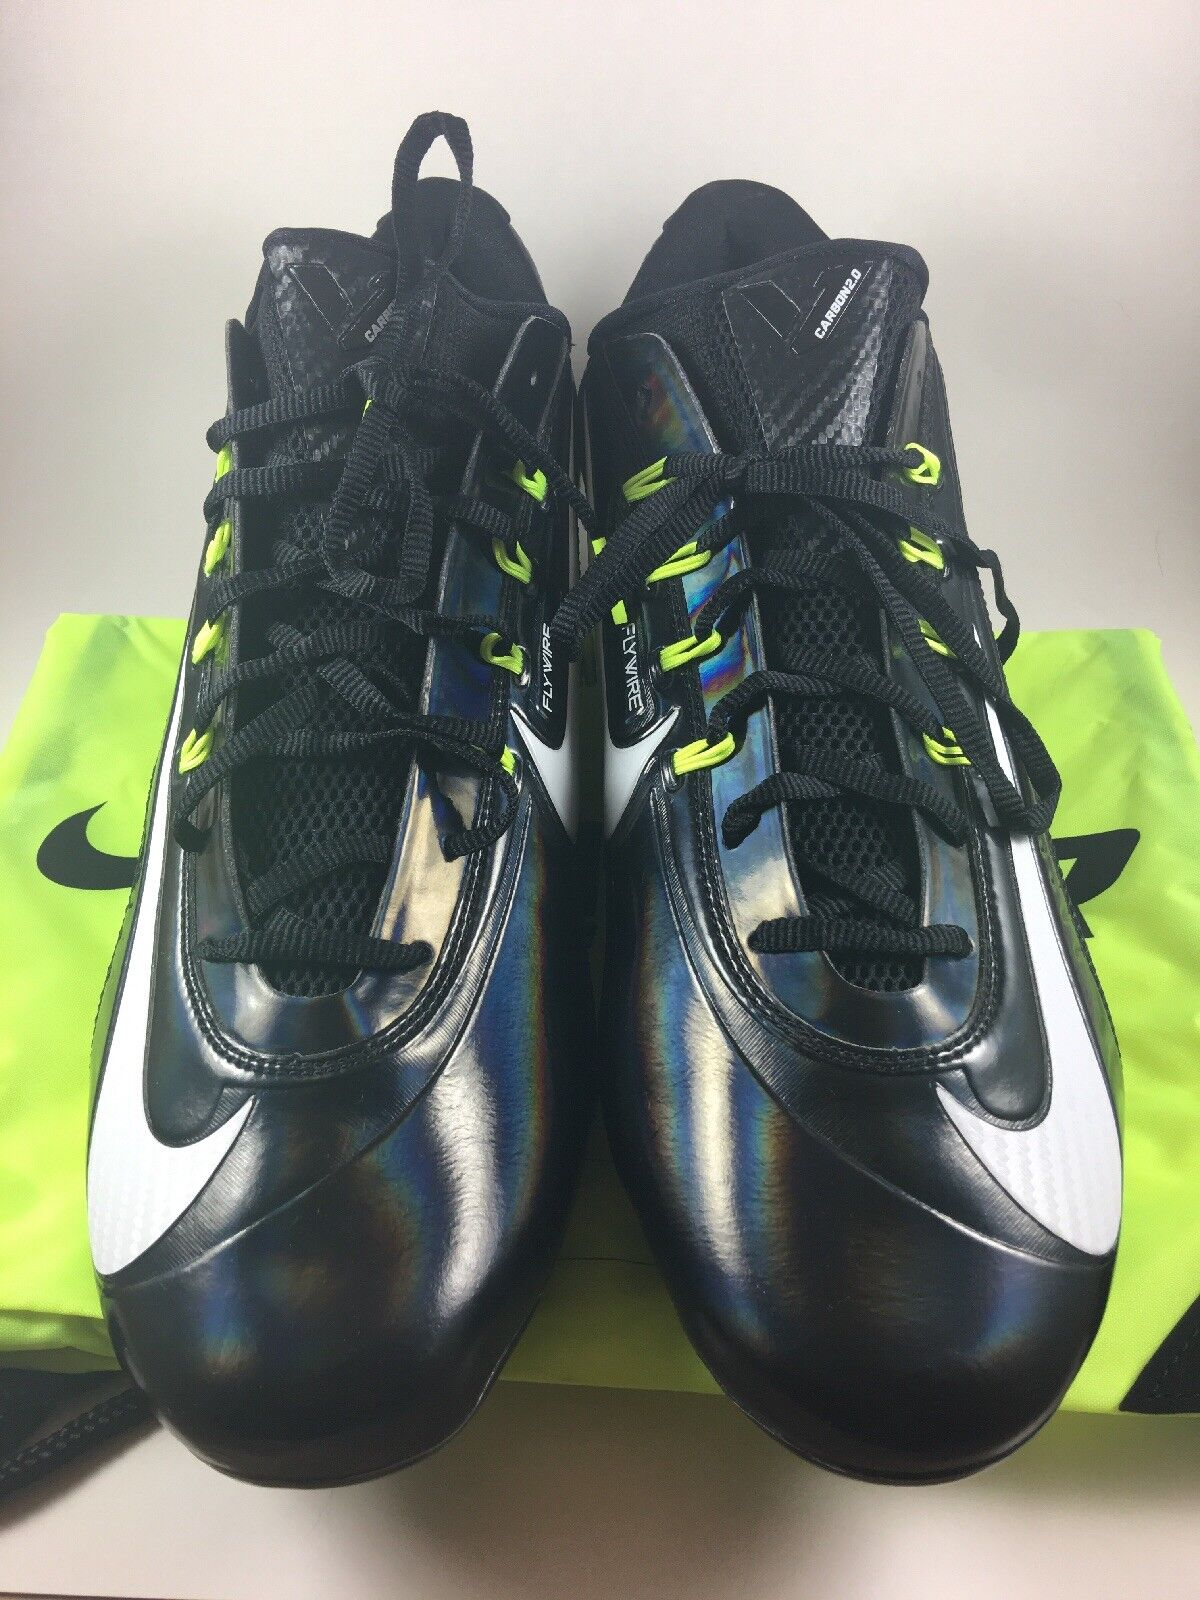 Sz 16 Nike Vapor Carbon 2.0 Elite TD Football Cleats Triple Black White